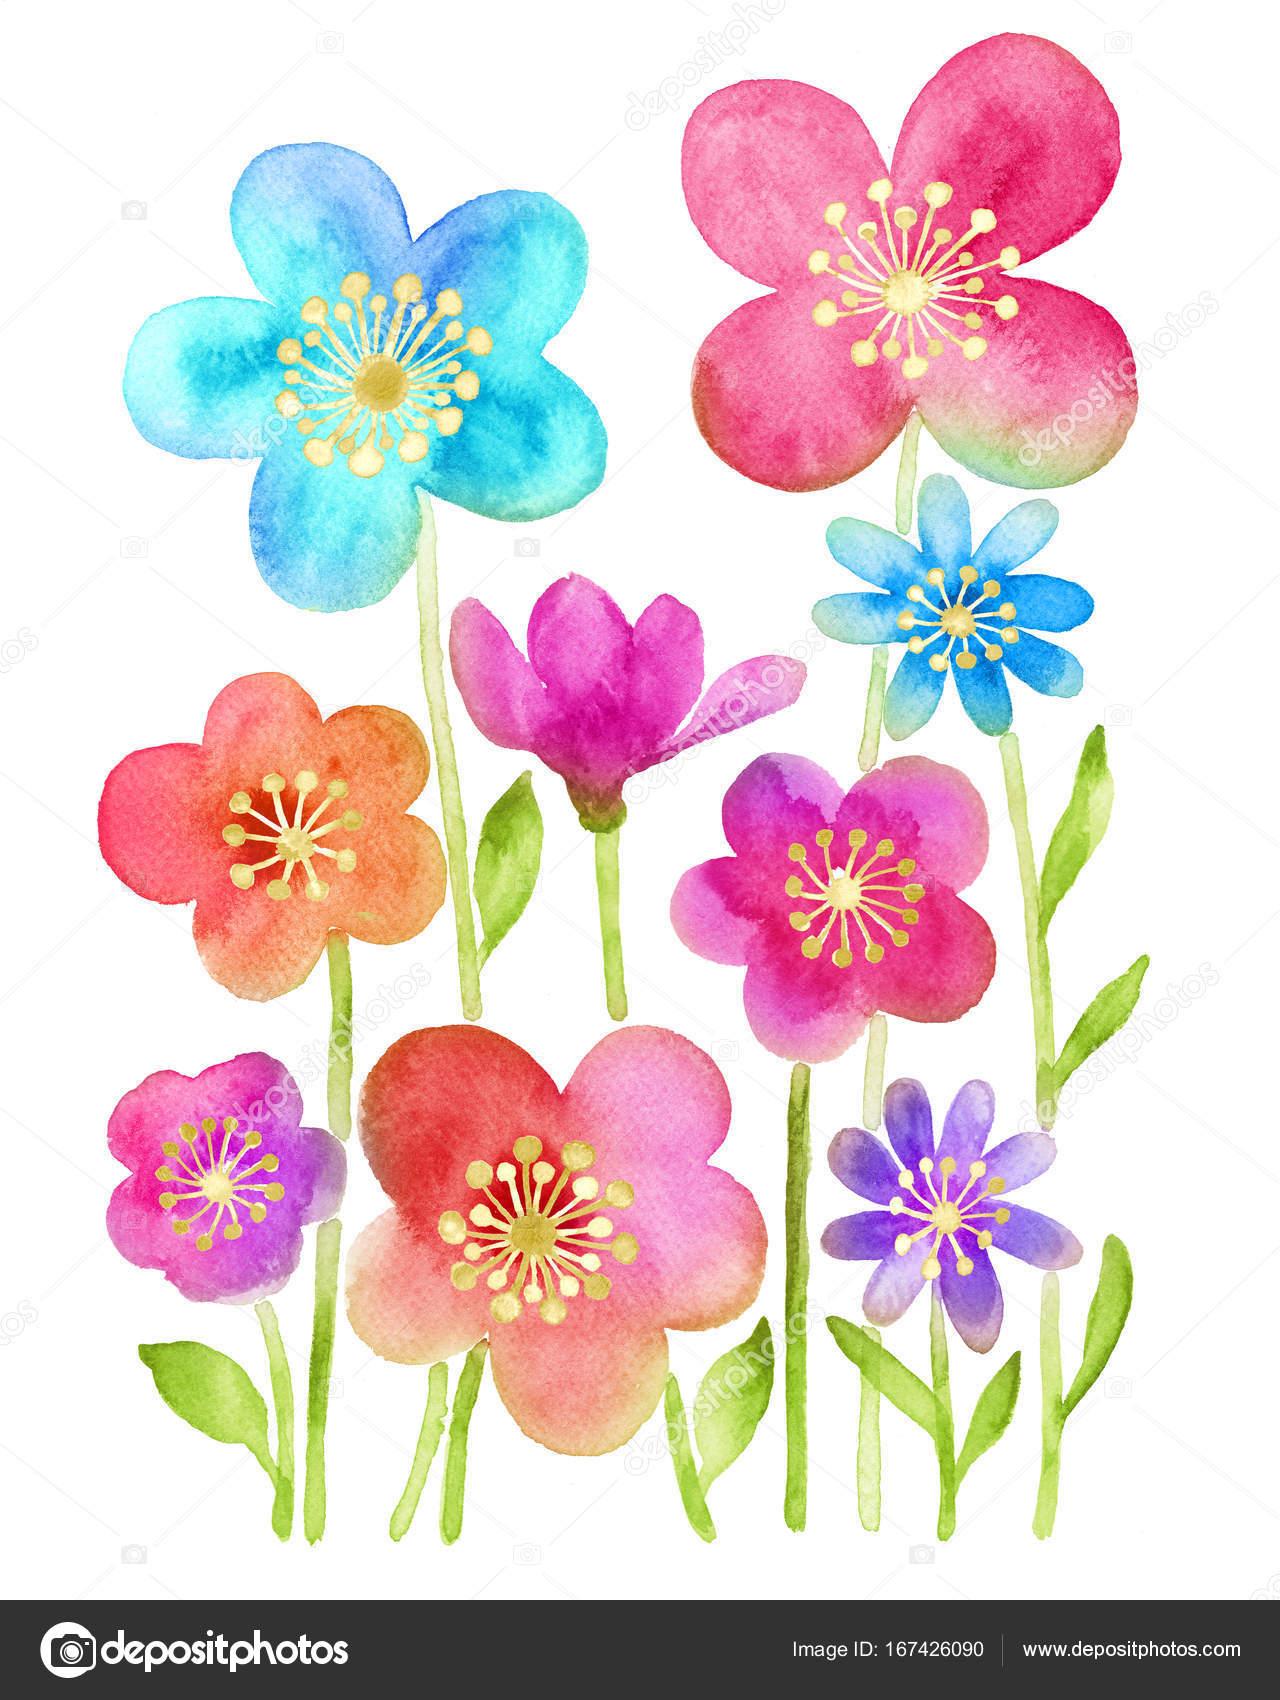 Fleur Illustration fleur illustration aquarelle — photographie tanginuk1205 © #167426090